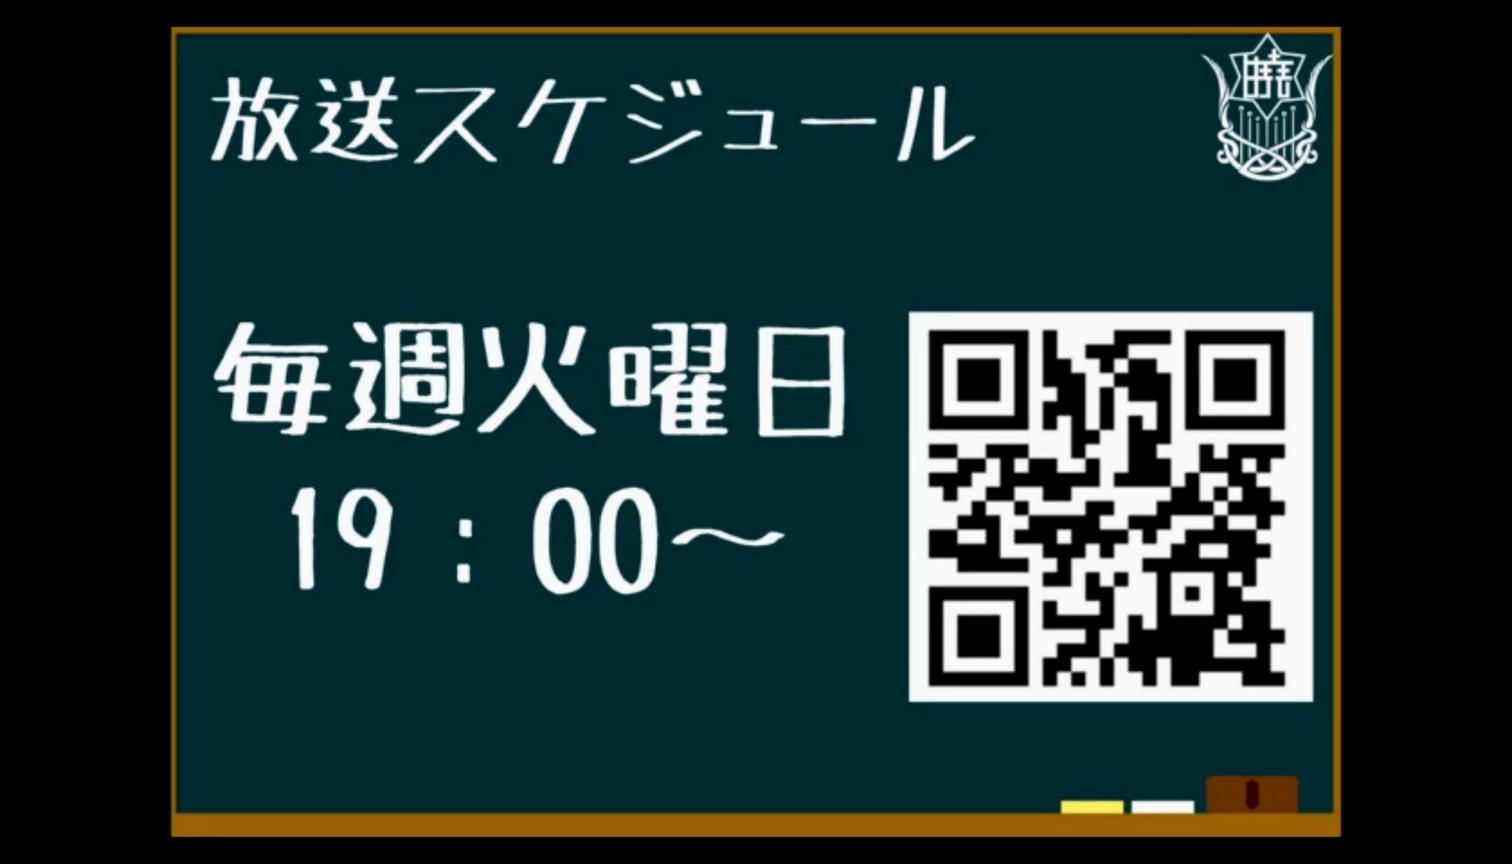 fow-live-180306-001.jpg